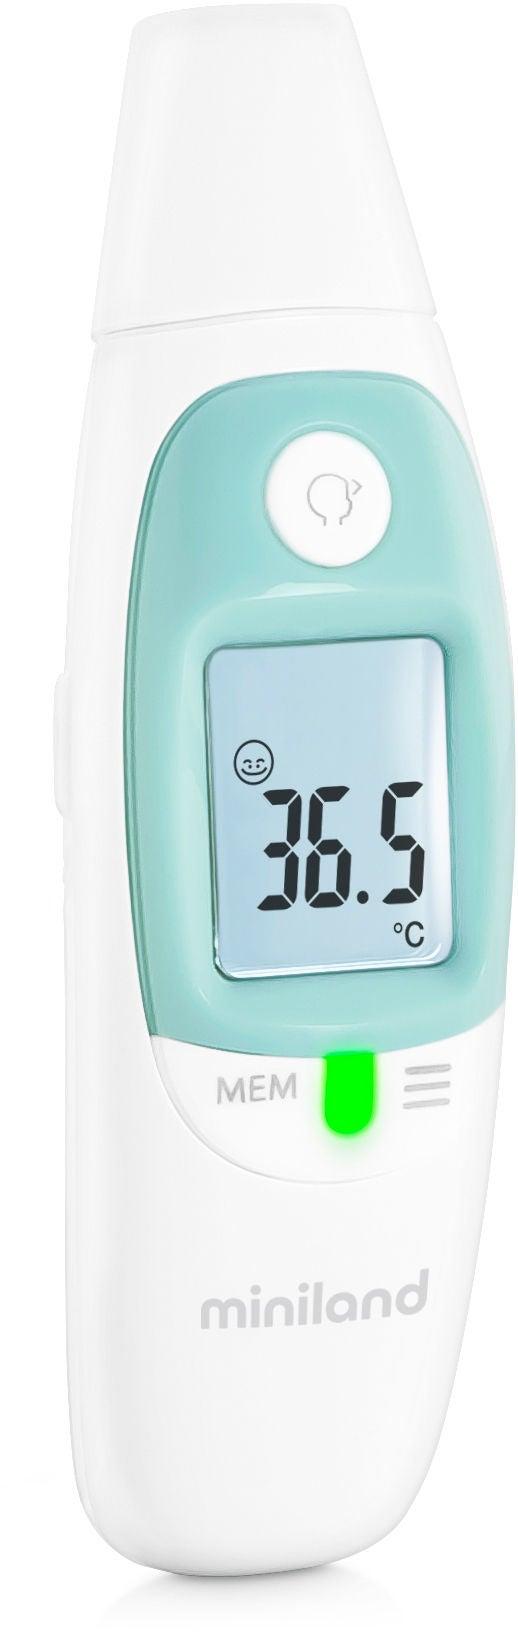 Miniland Thermosense Febertermometer